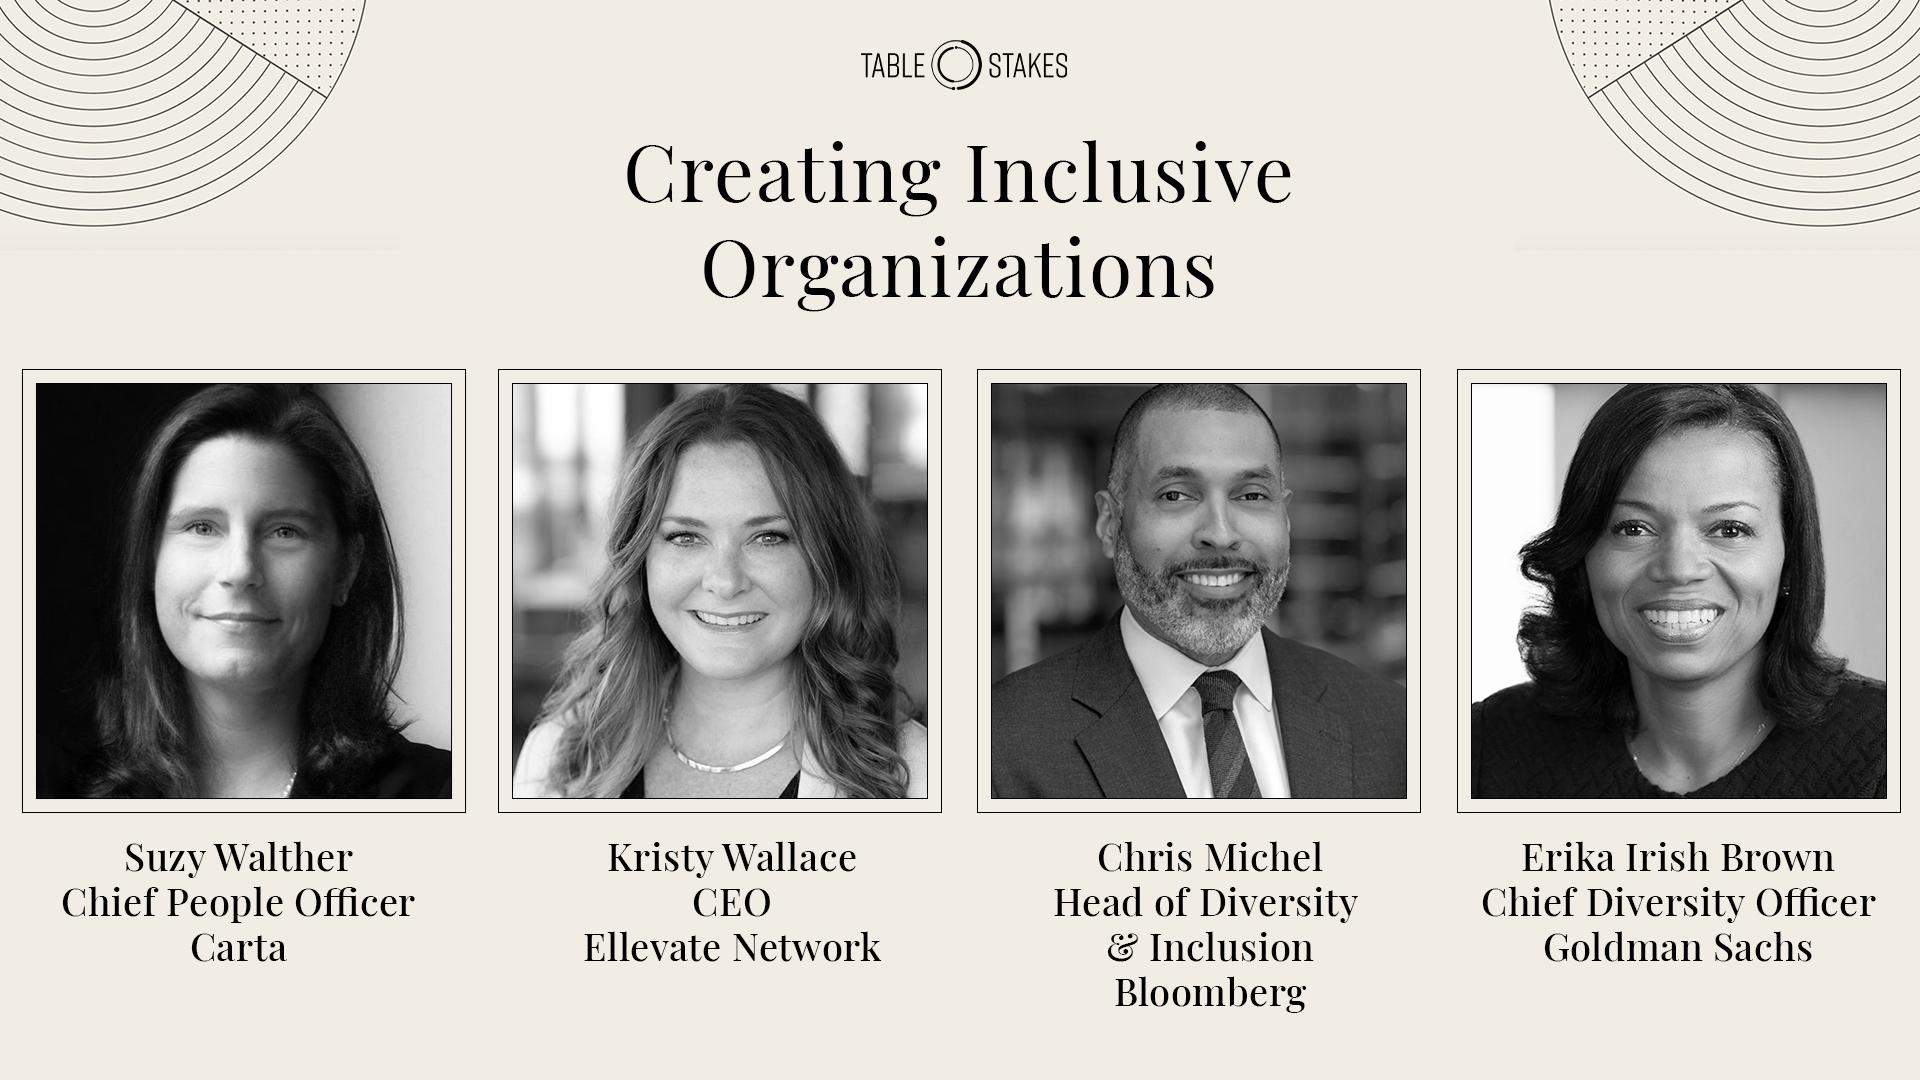 Creating Inclusive Organizations